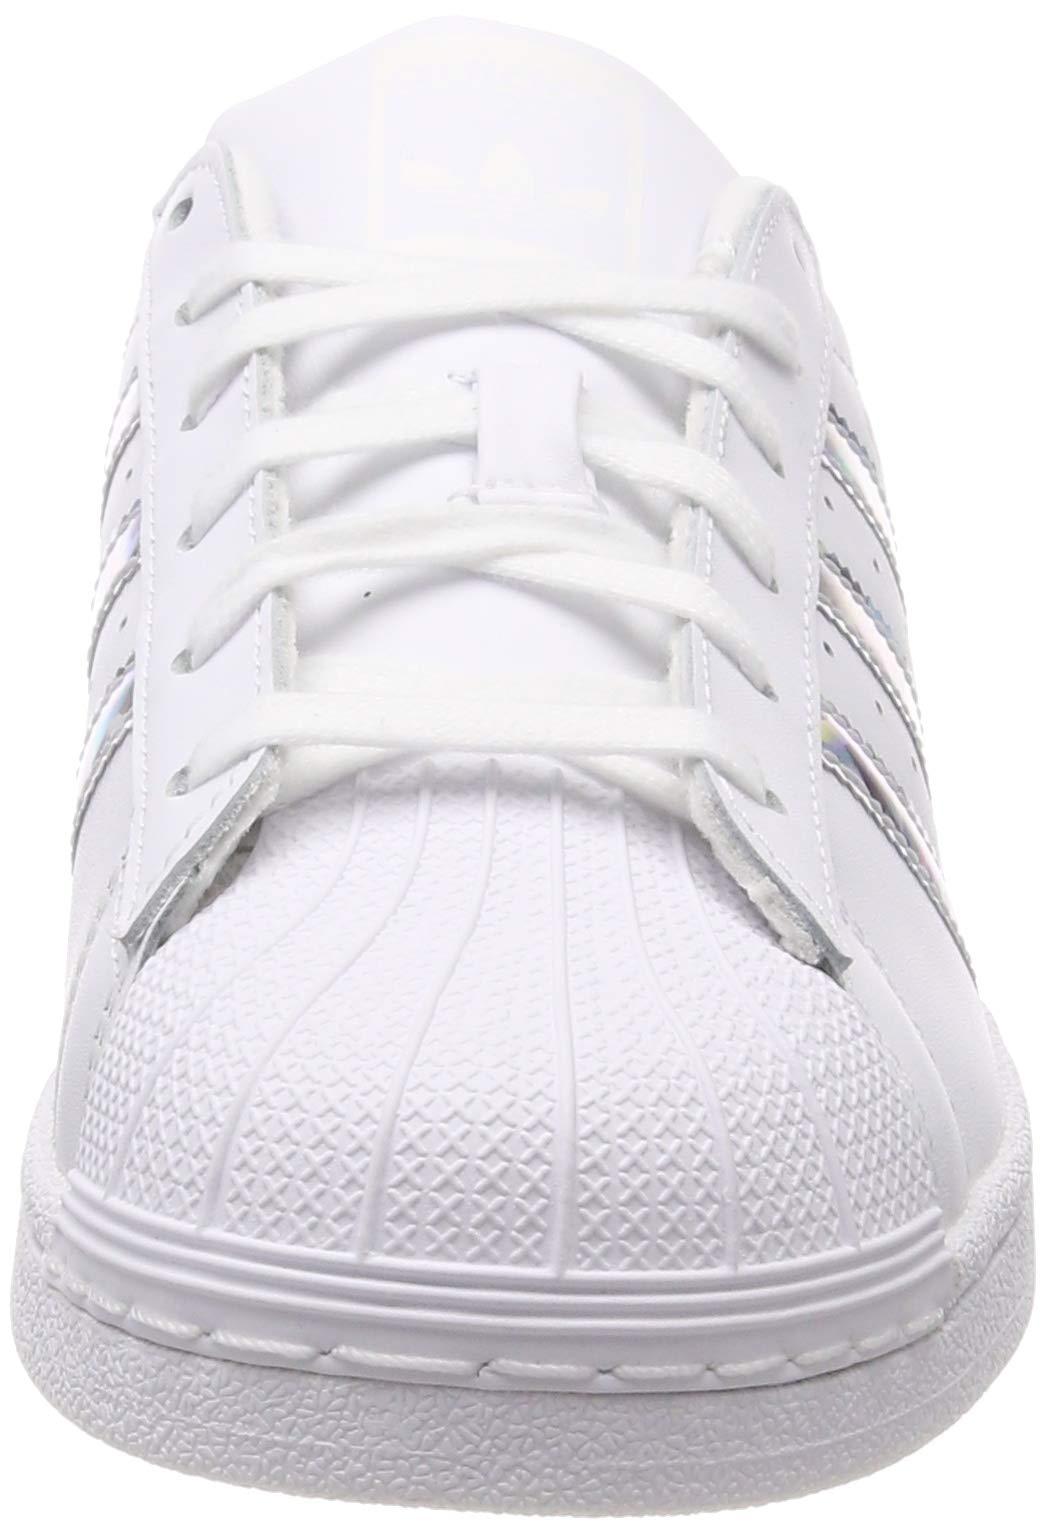 adidas Superstar J, Scarpe da Ginnastica Unisex-Bambini 4 spesavip